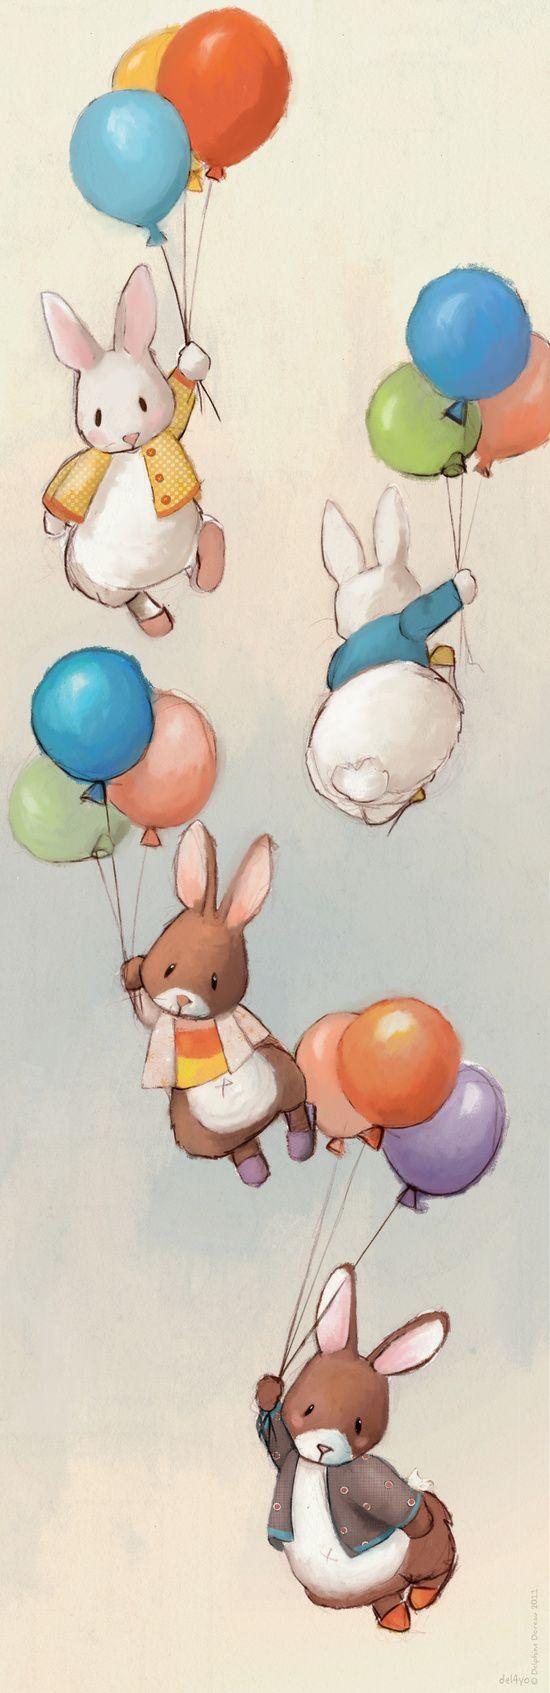 Voando impressão Bunnies Art